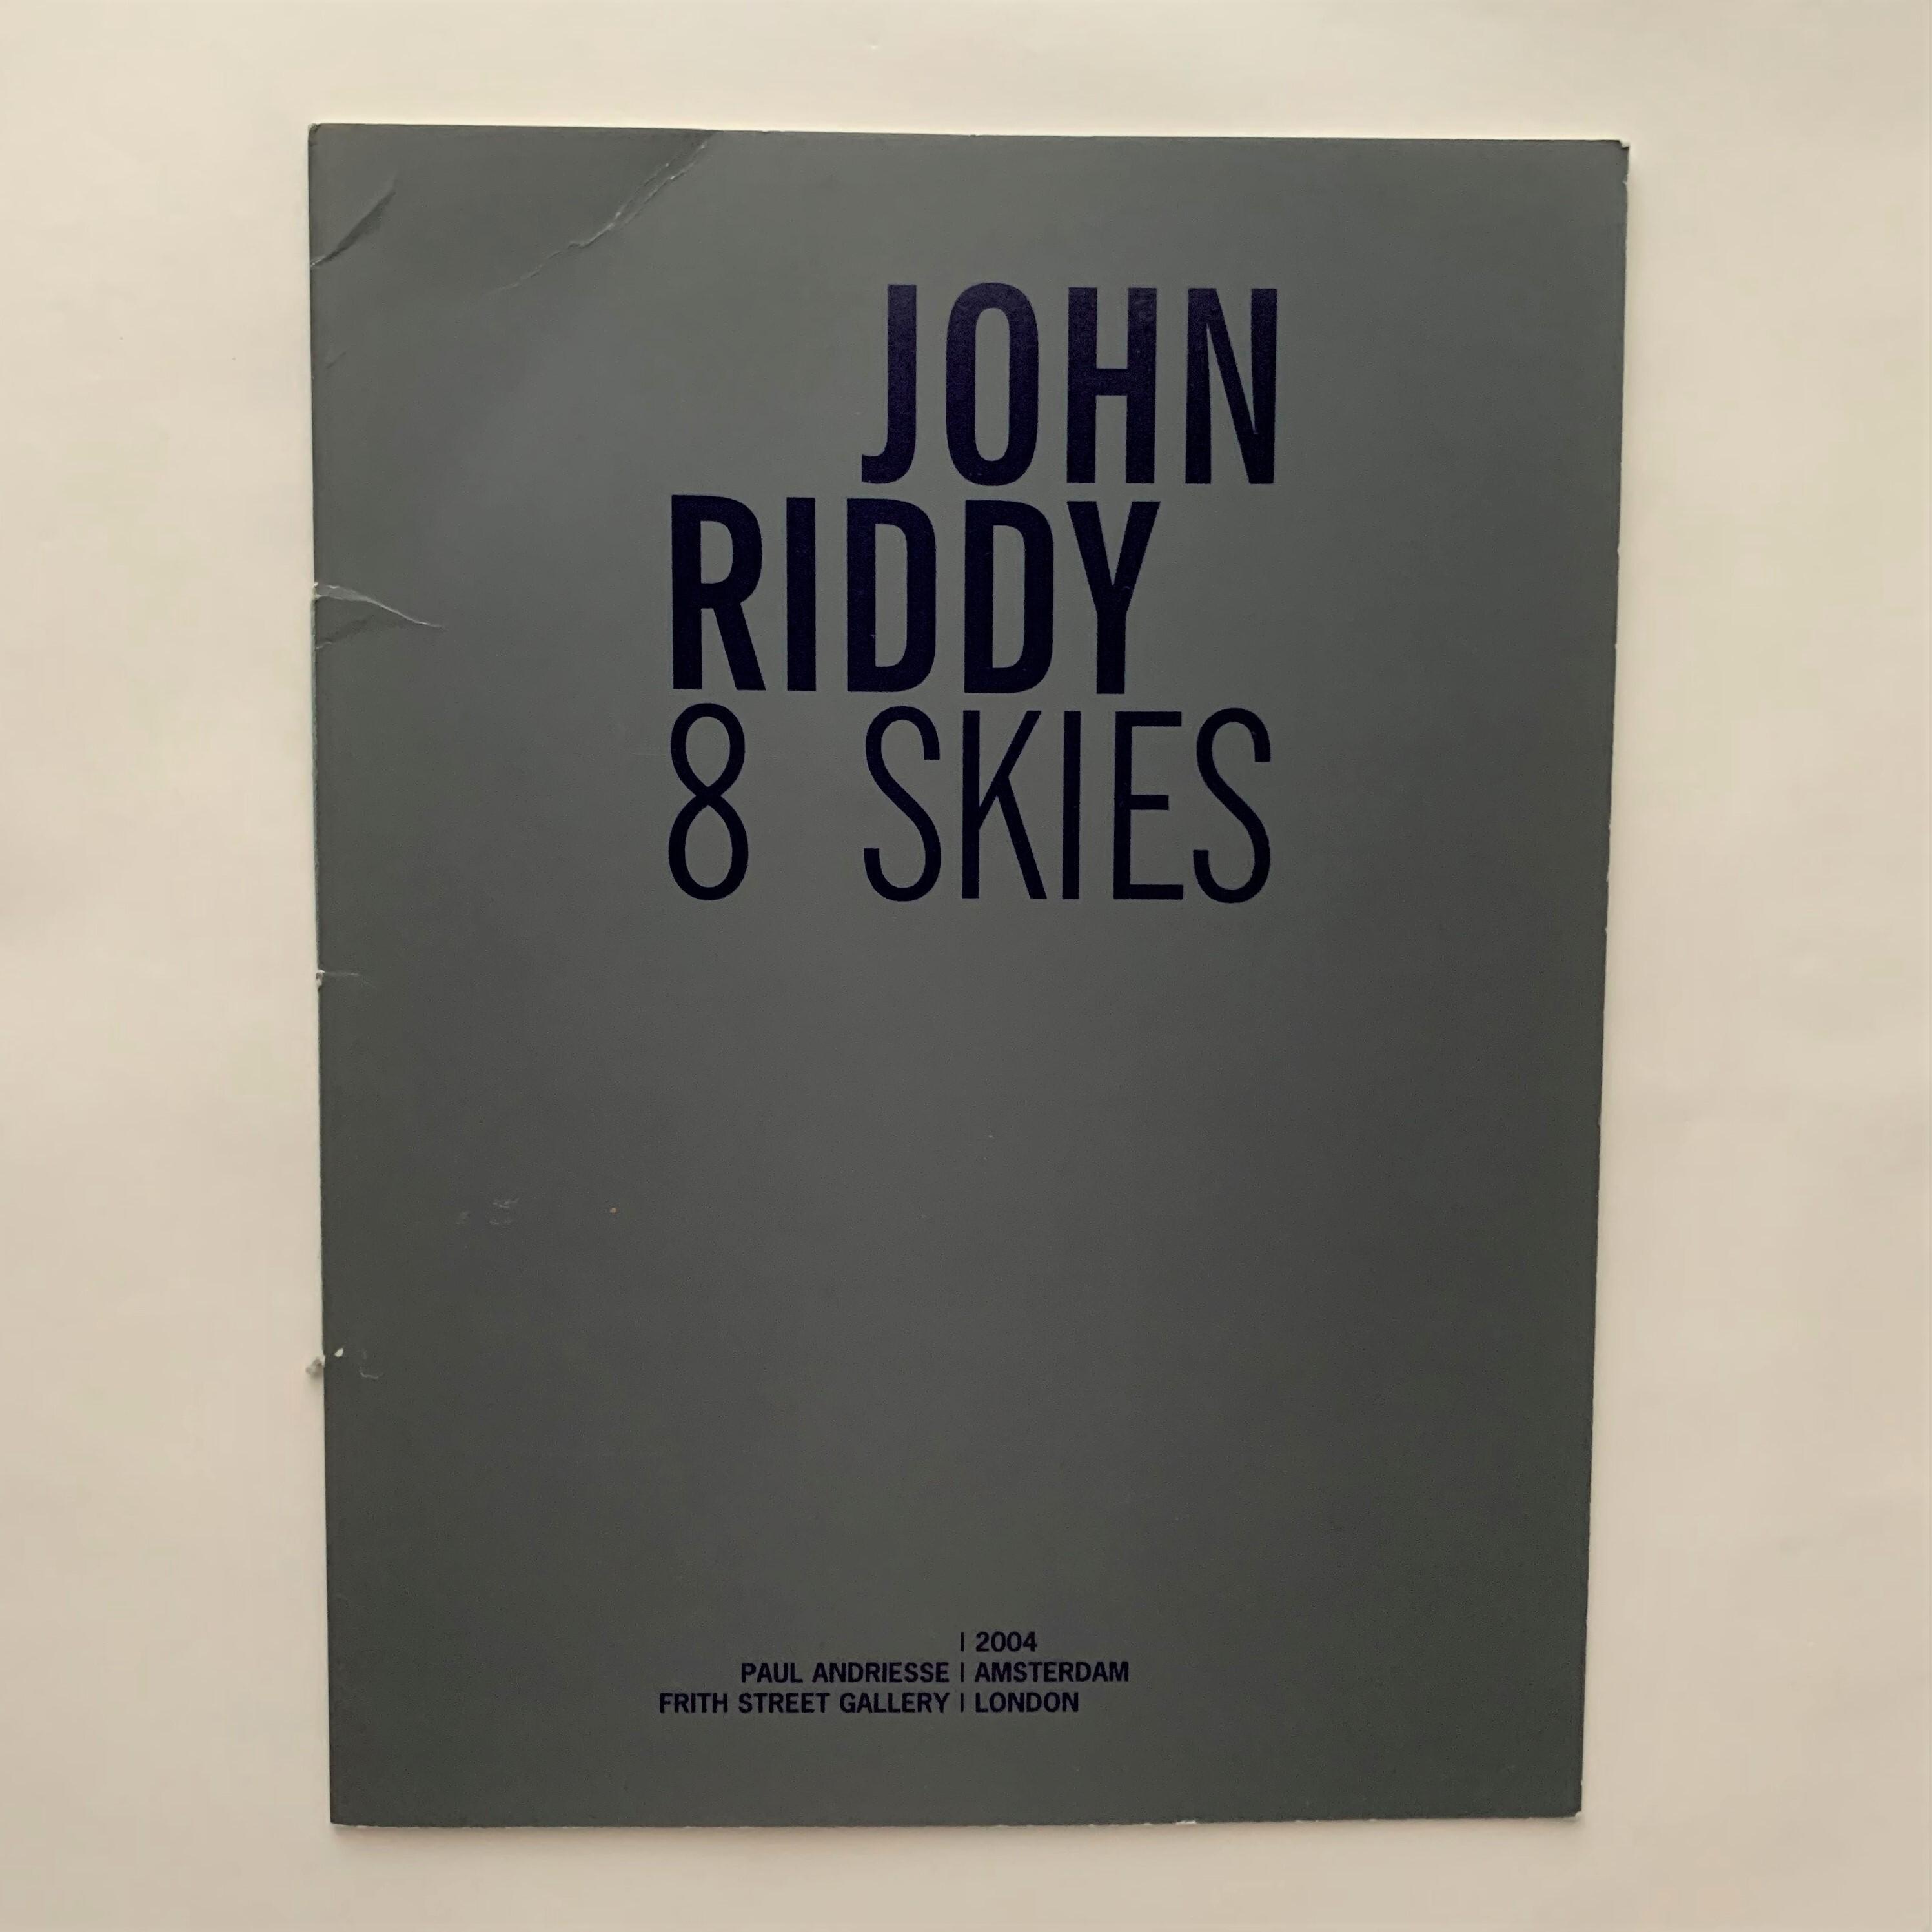 John Riddy - 8 Skies / ジョン・リディ